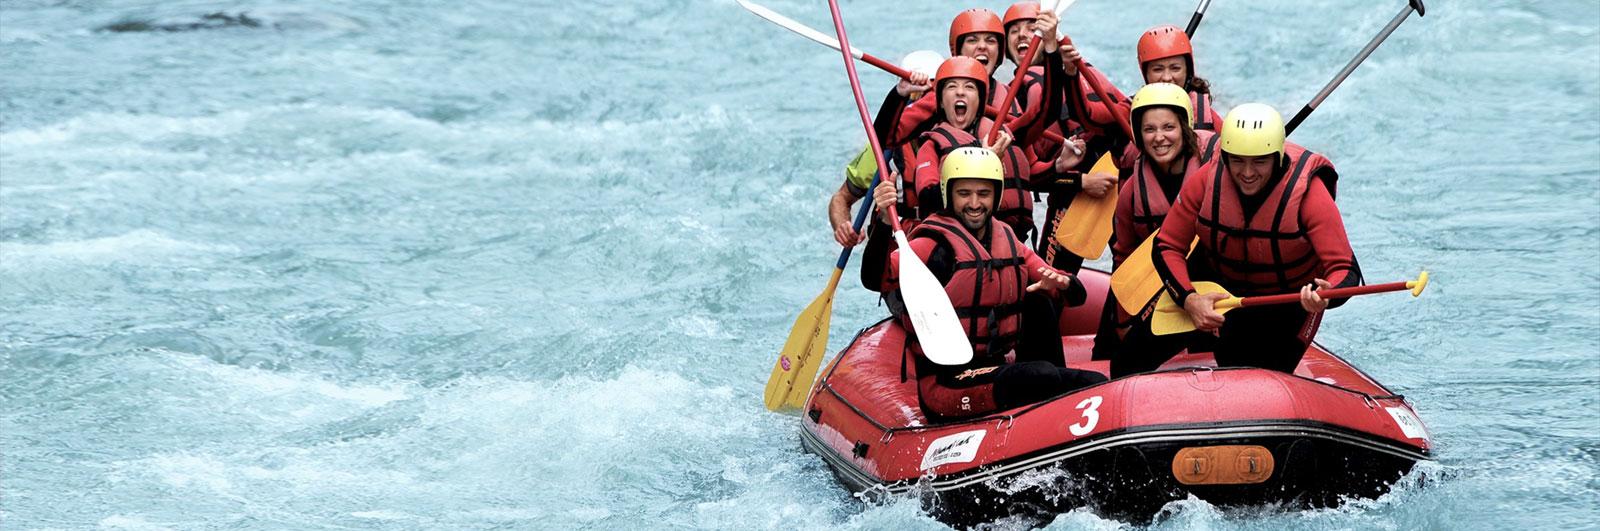 nunayak rafting - canyoning alpes haute savoie 74